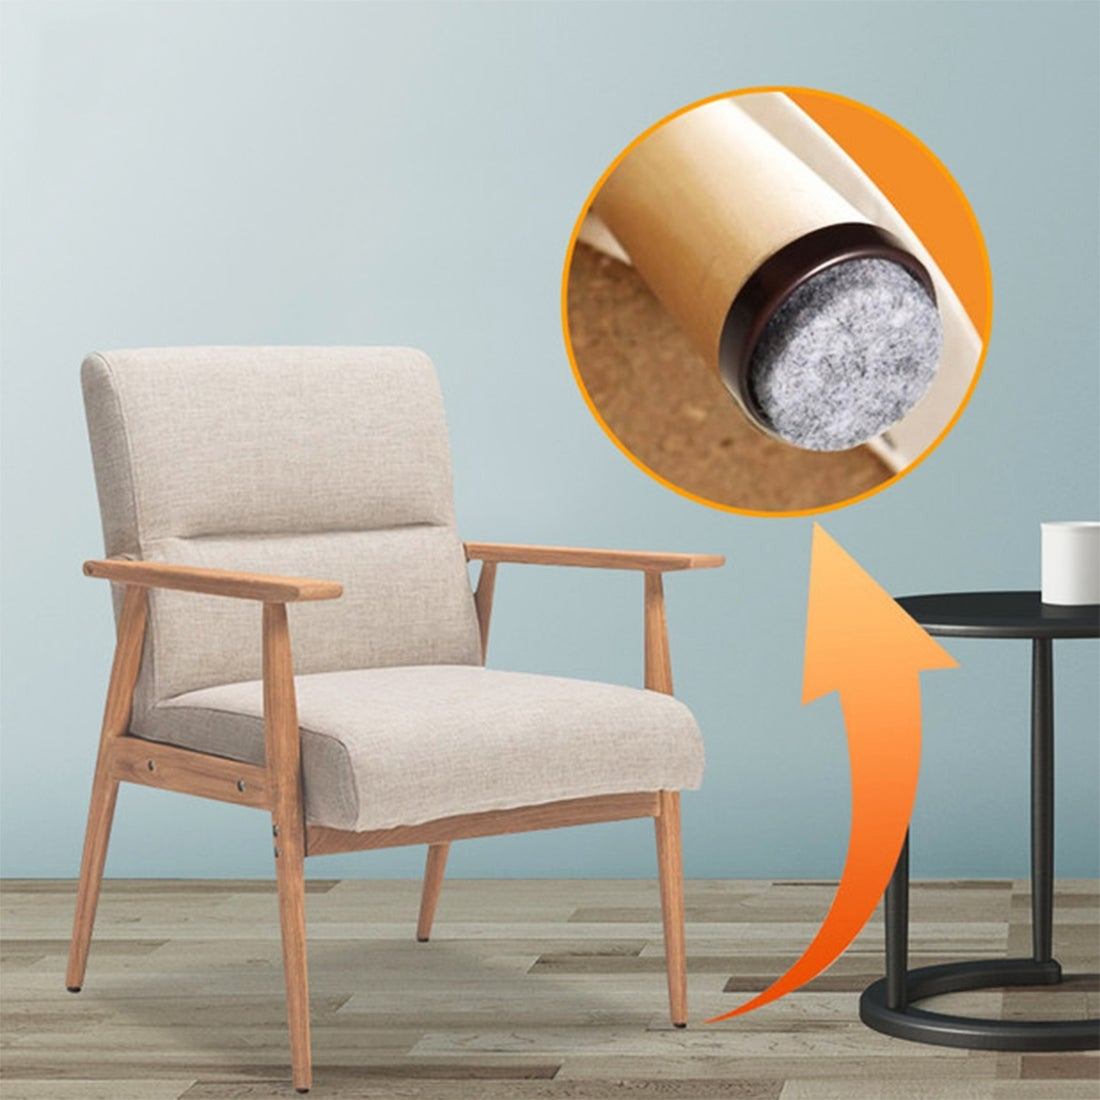 Furniture Glides Durable Felt Glider Chair Glides with Nail 20 24 28 MM